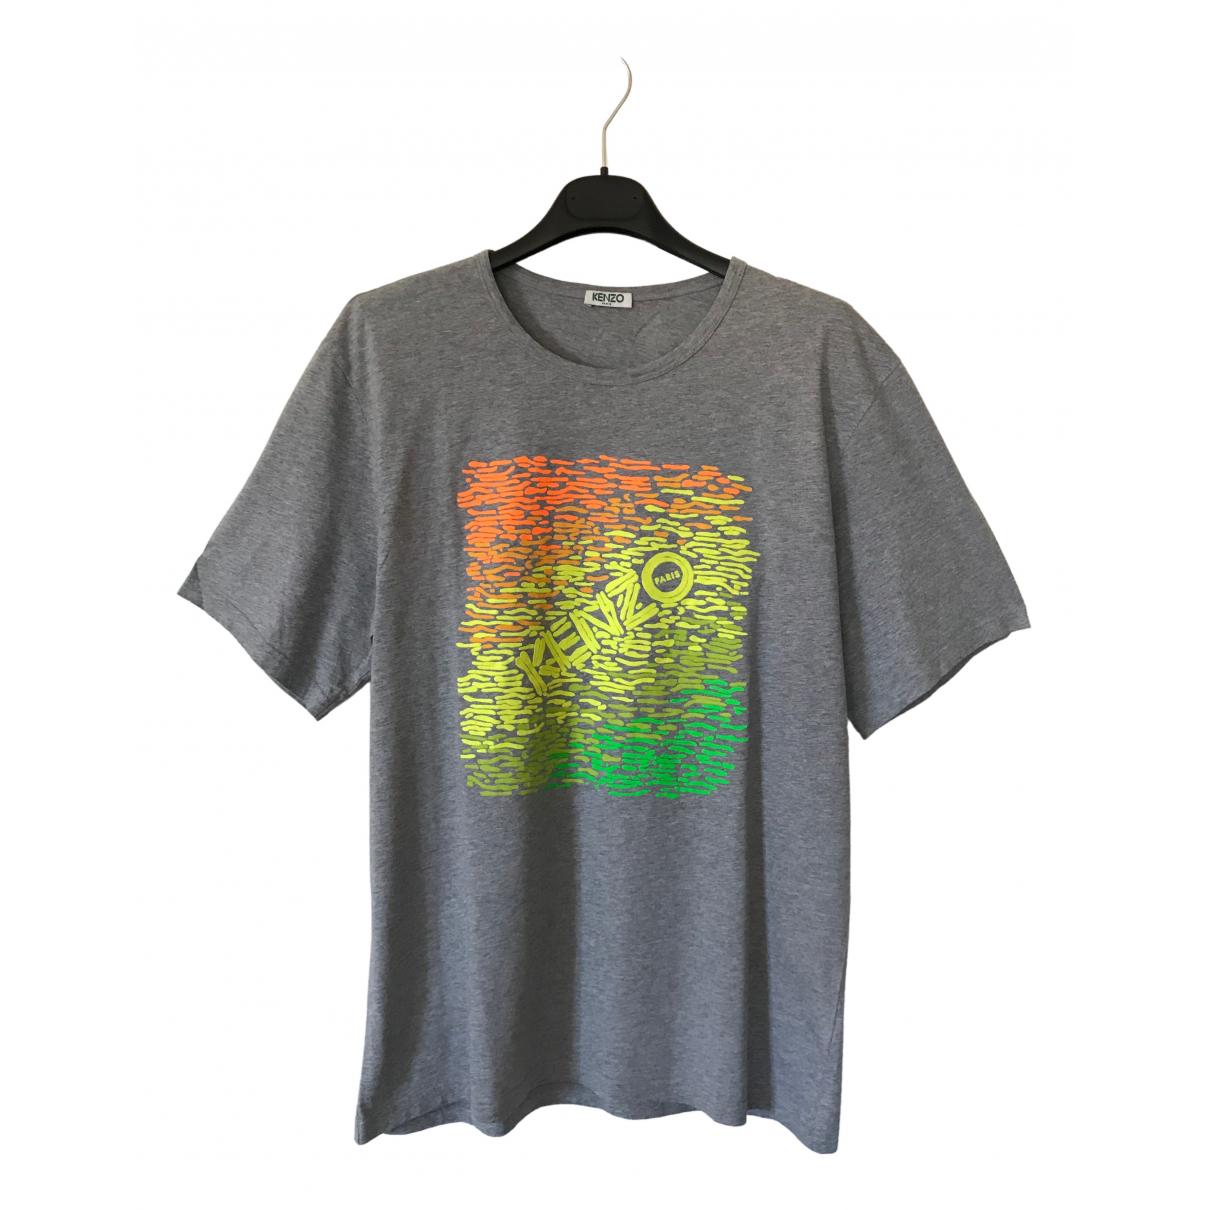 Kenzo \N Grey Cotton T-shirts for Men L International